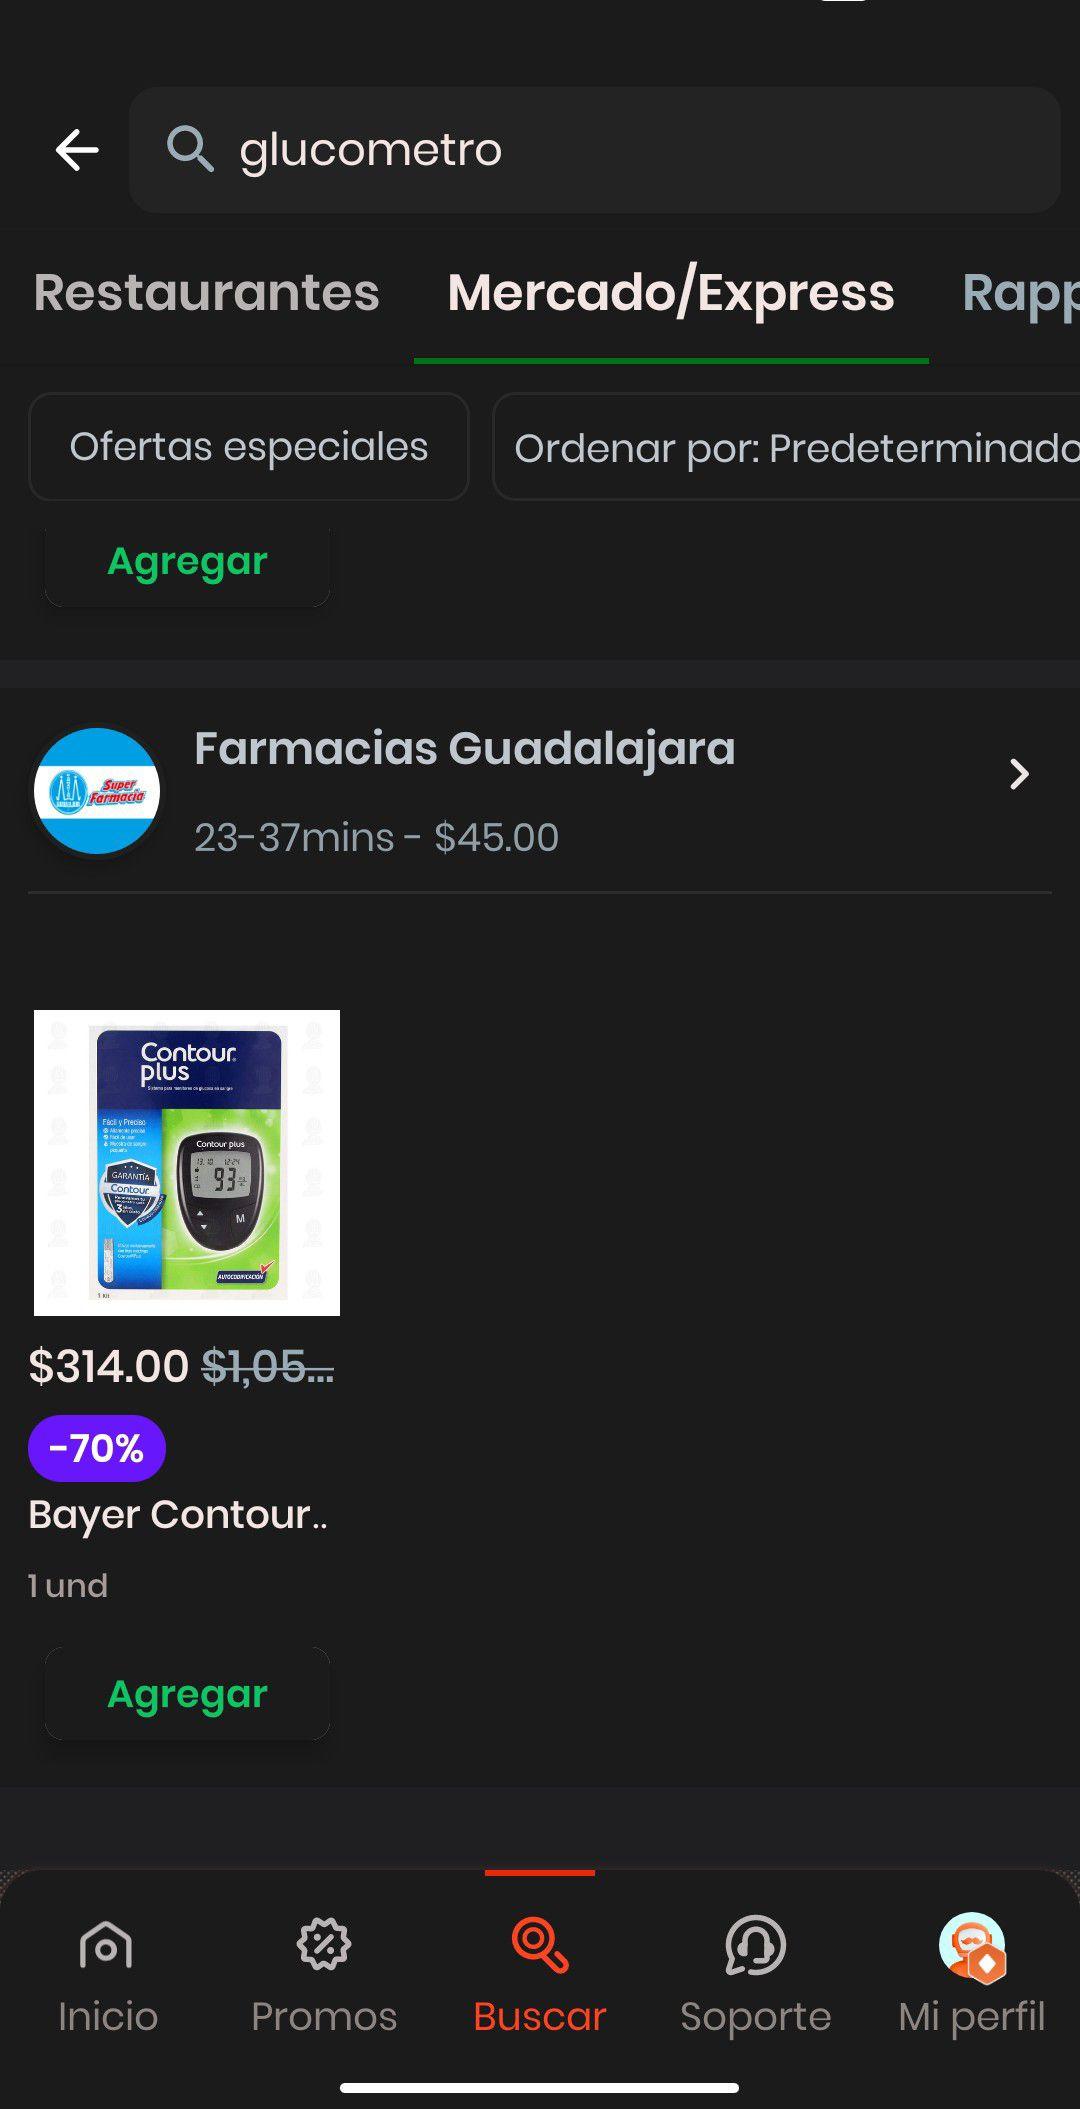 Rappi y Farmacias Guadalajara: Glucometro contours